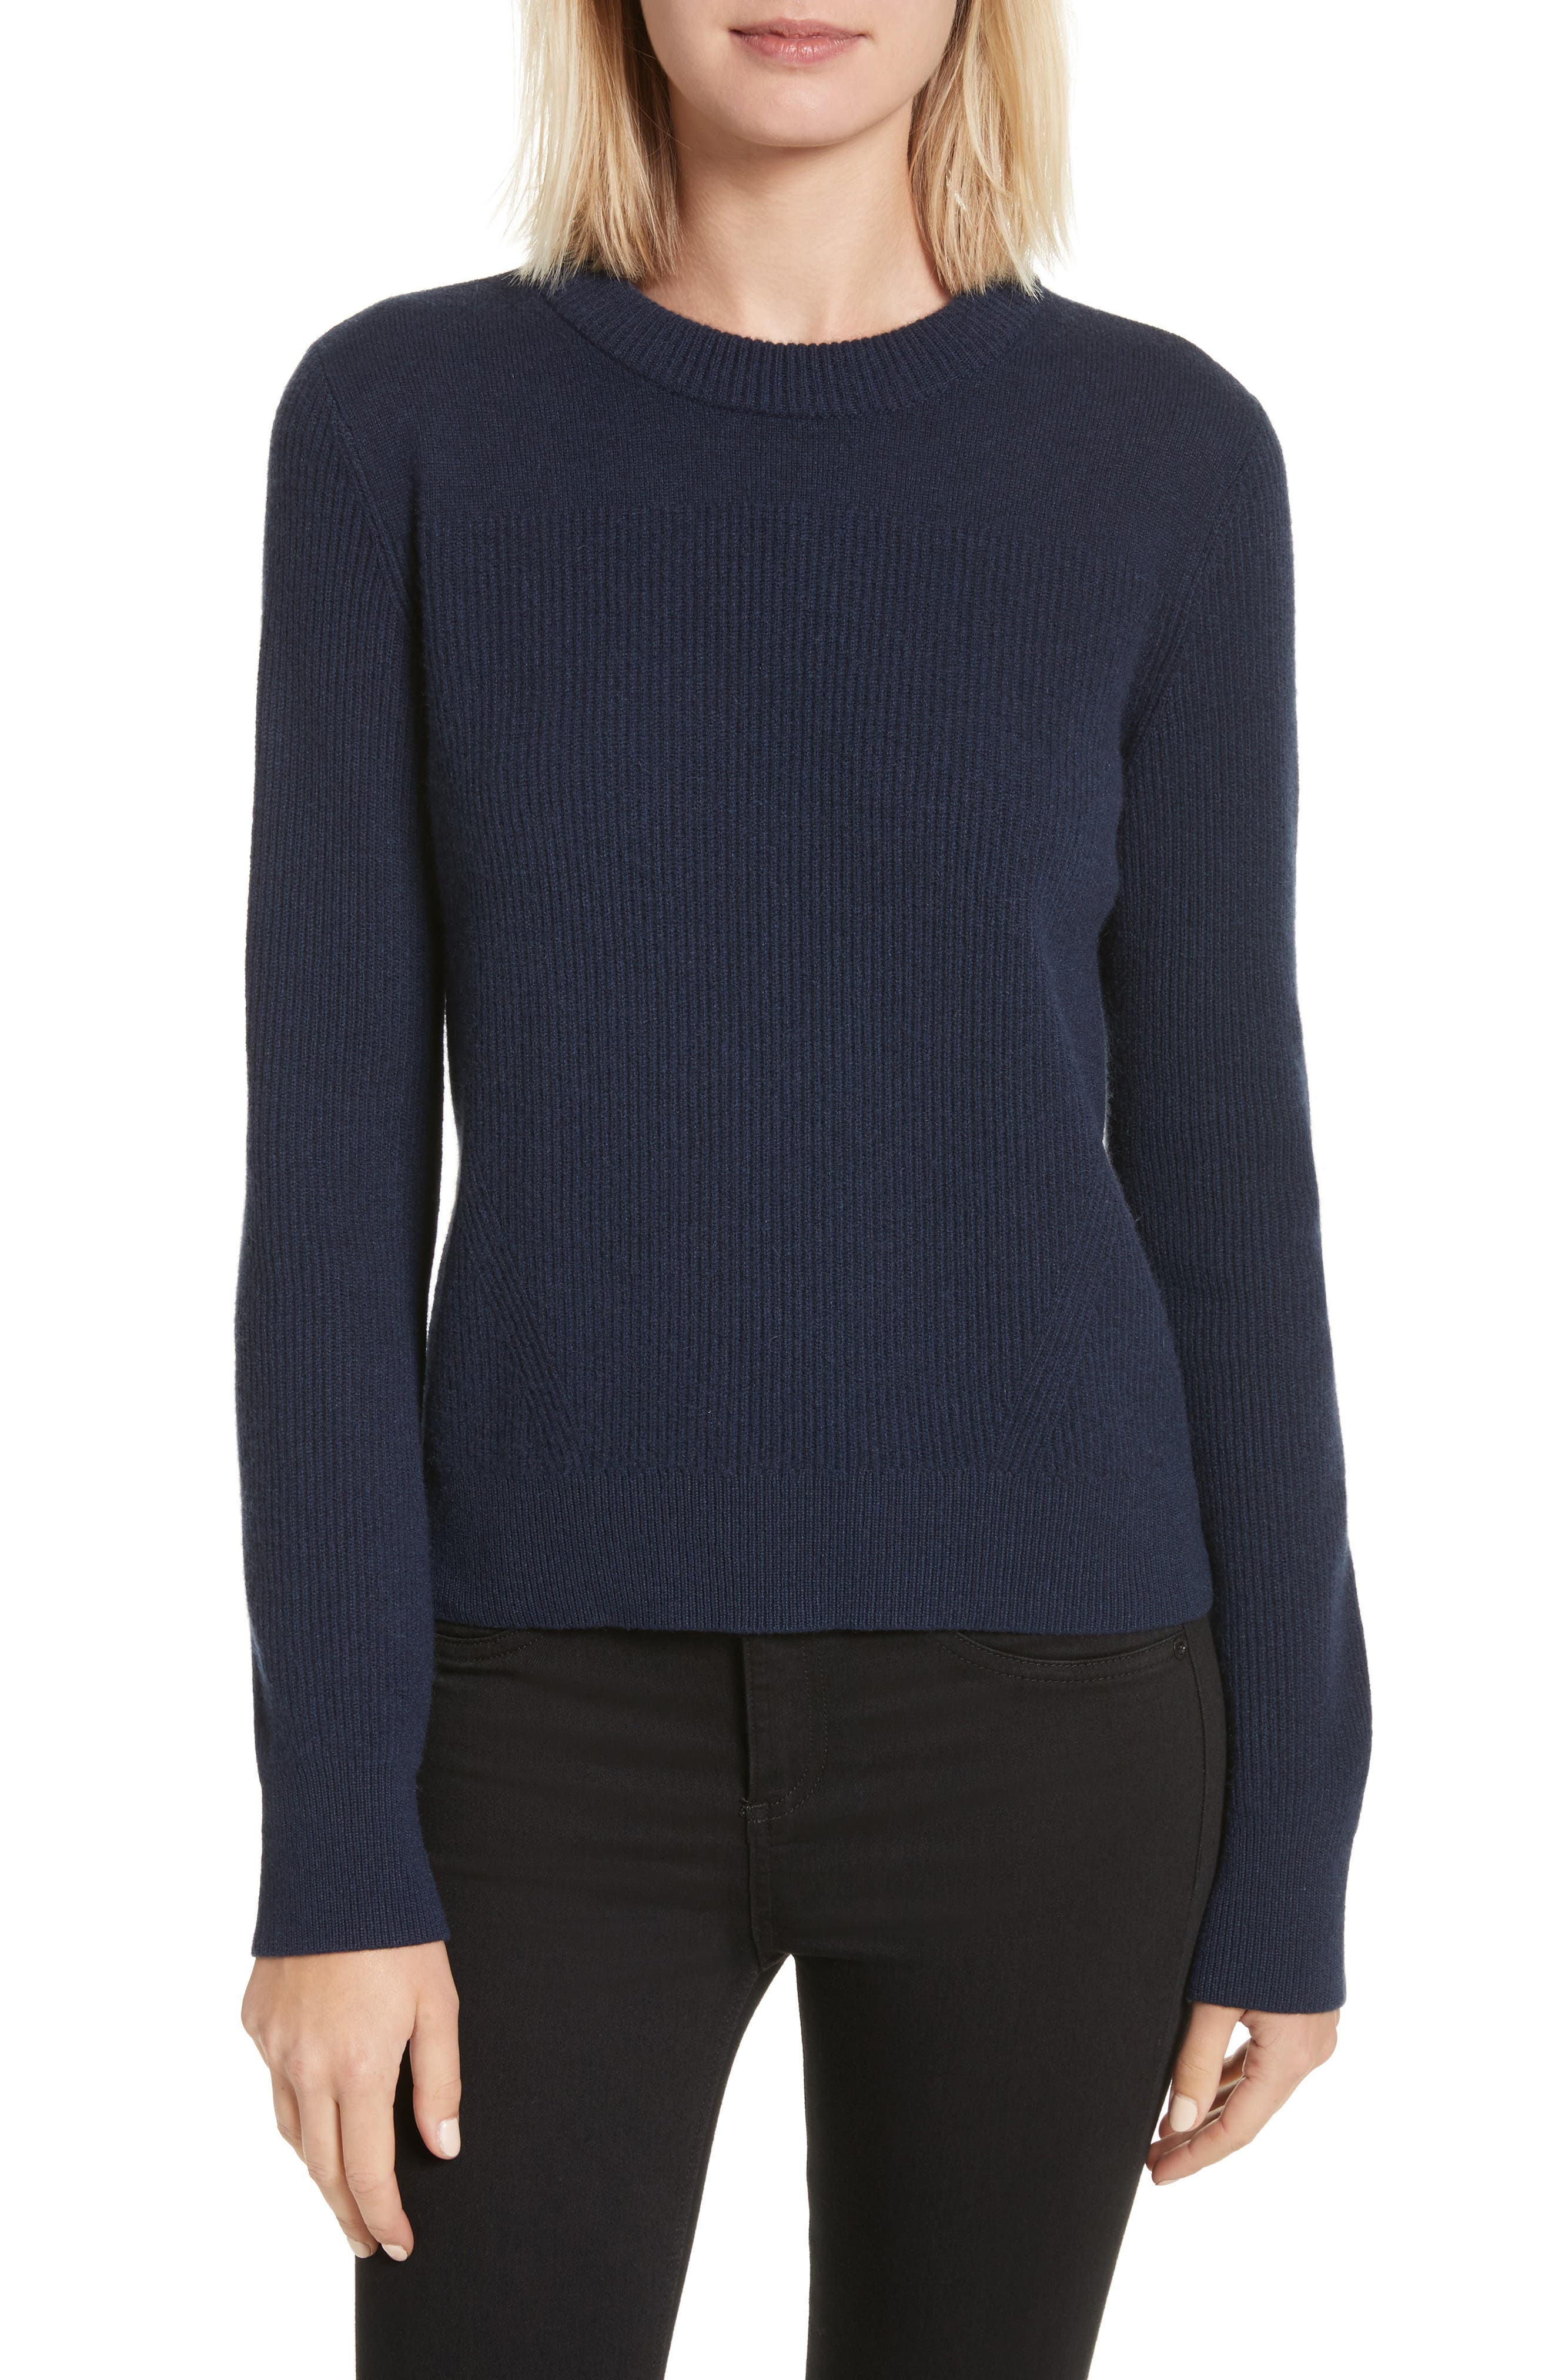 Ace Cashmere Crop Sweater,                             Main thumbnail 1, color,                             410